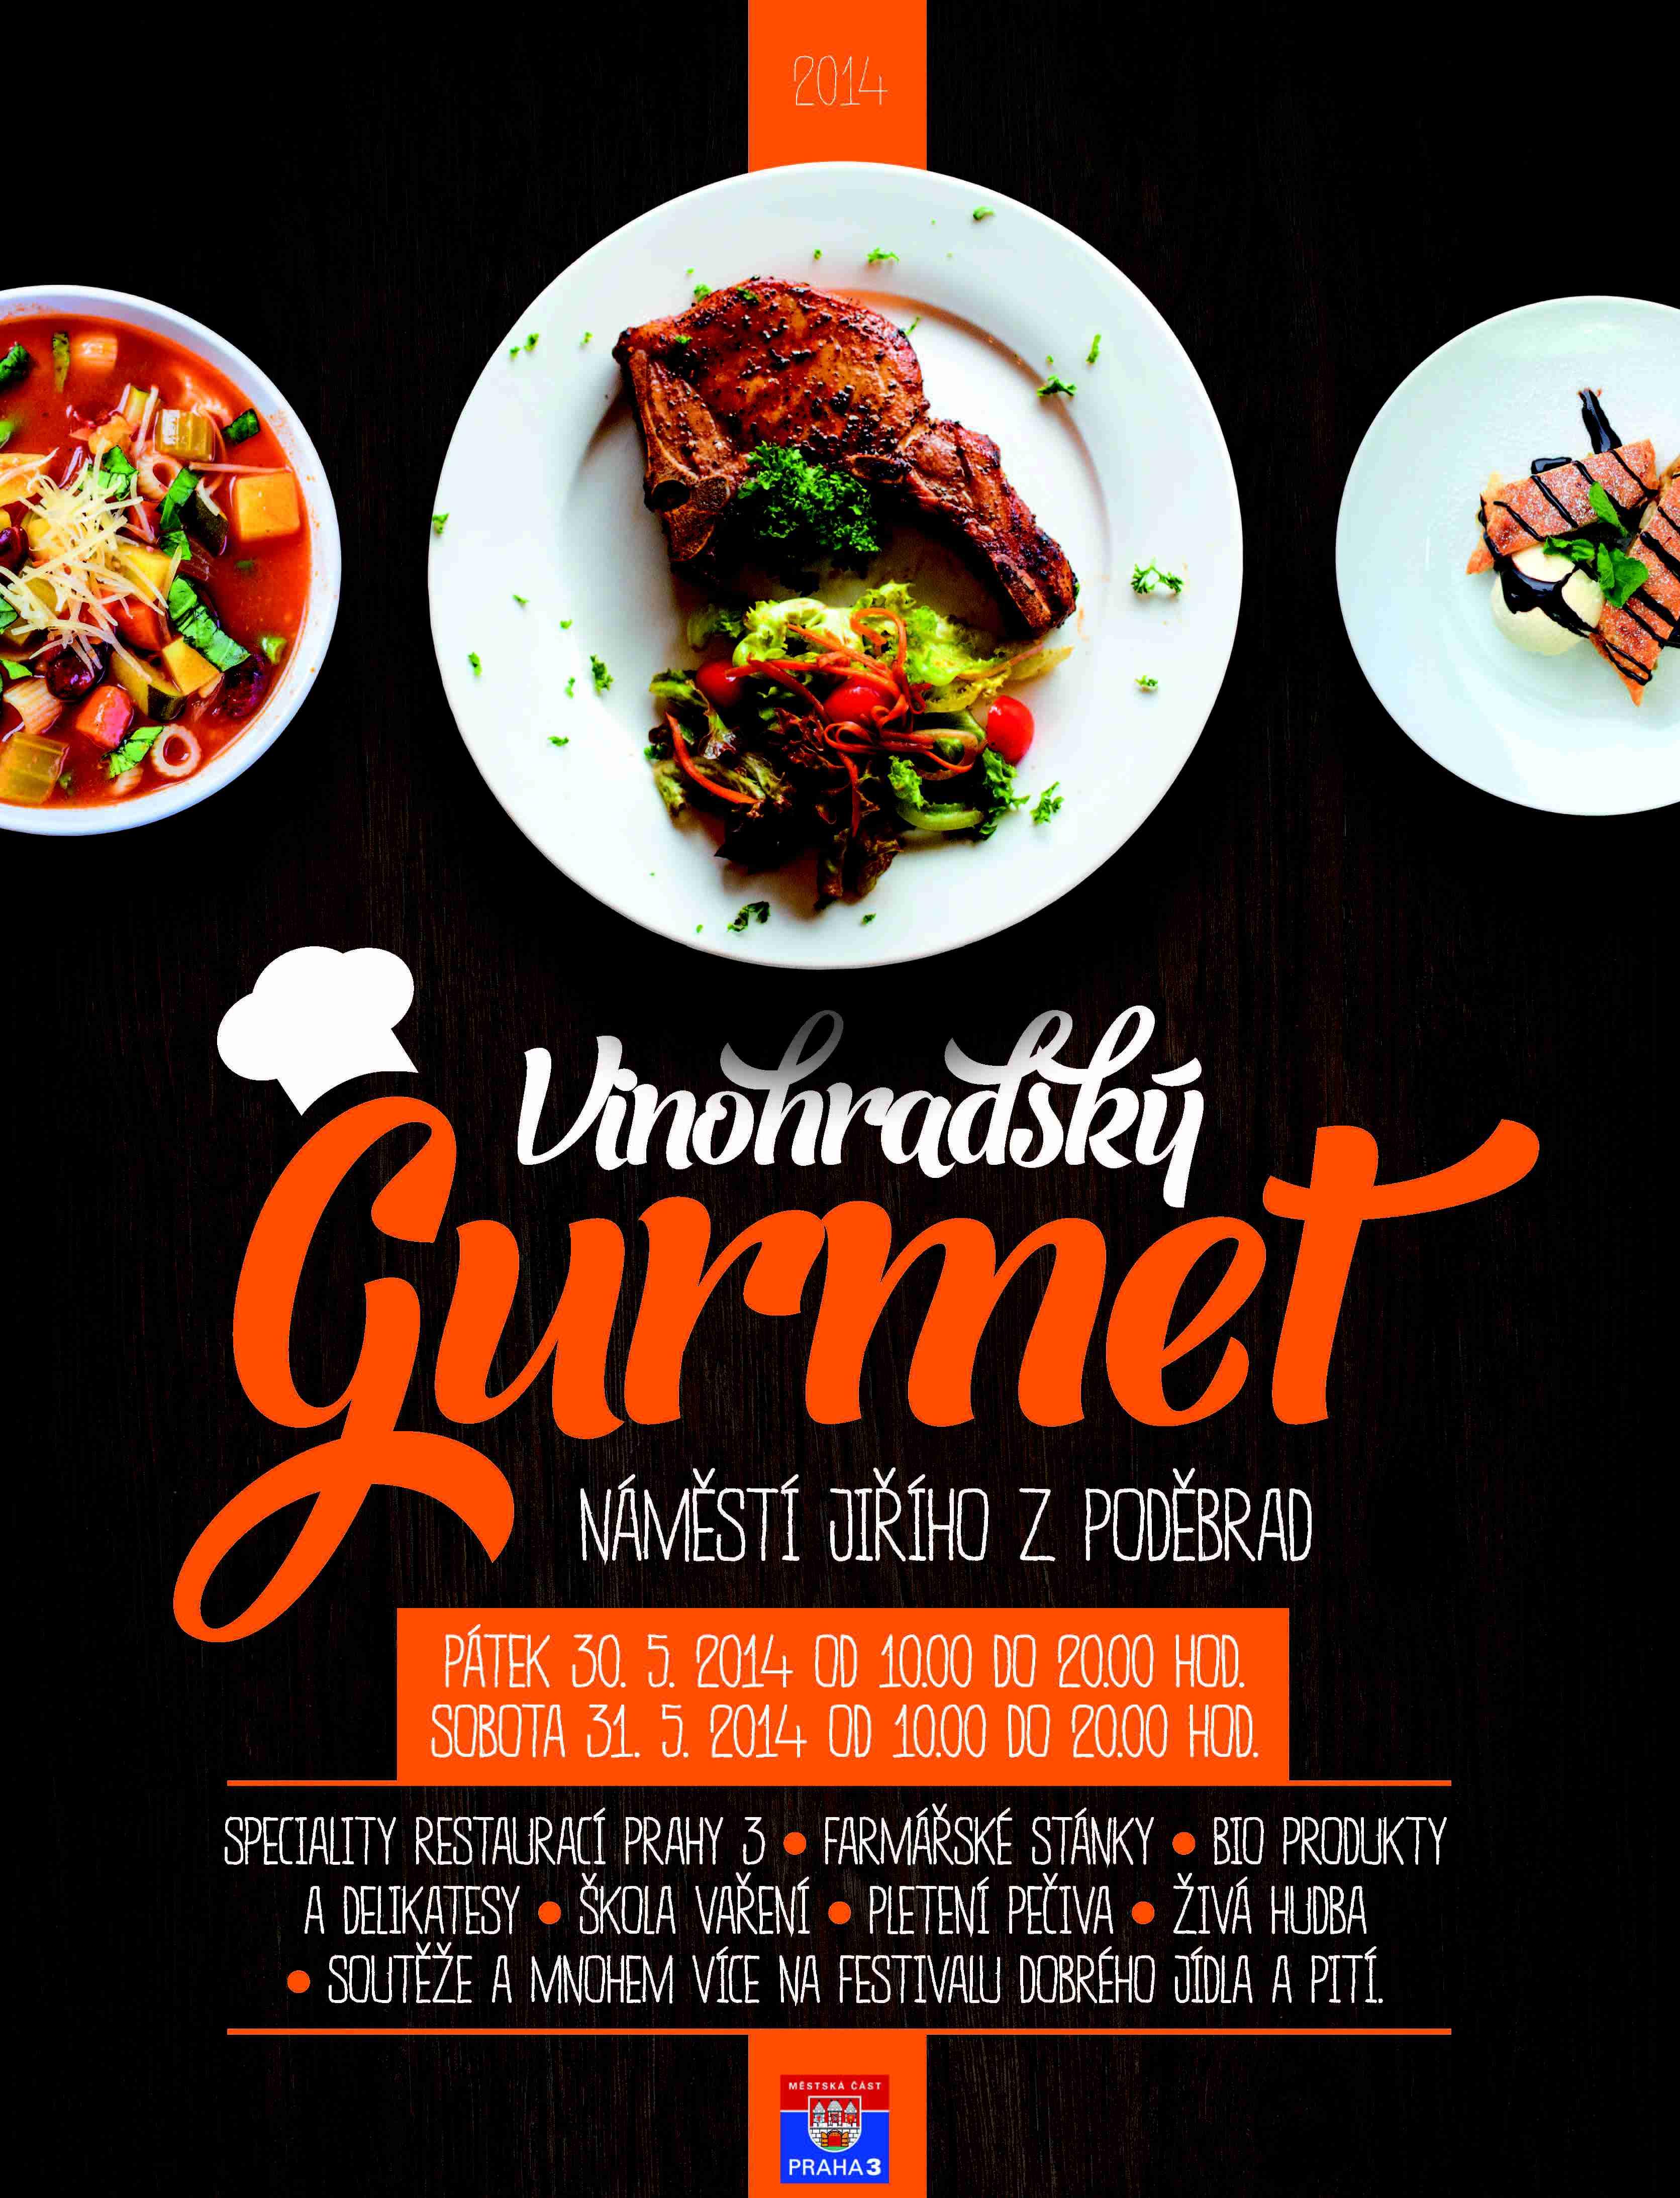 Ostraha a úklid Vinohradský Gurmet 2014